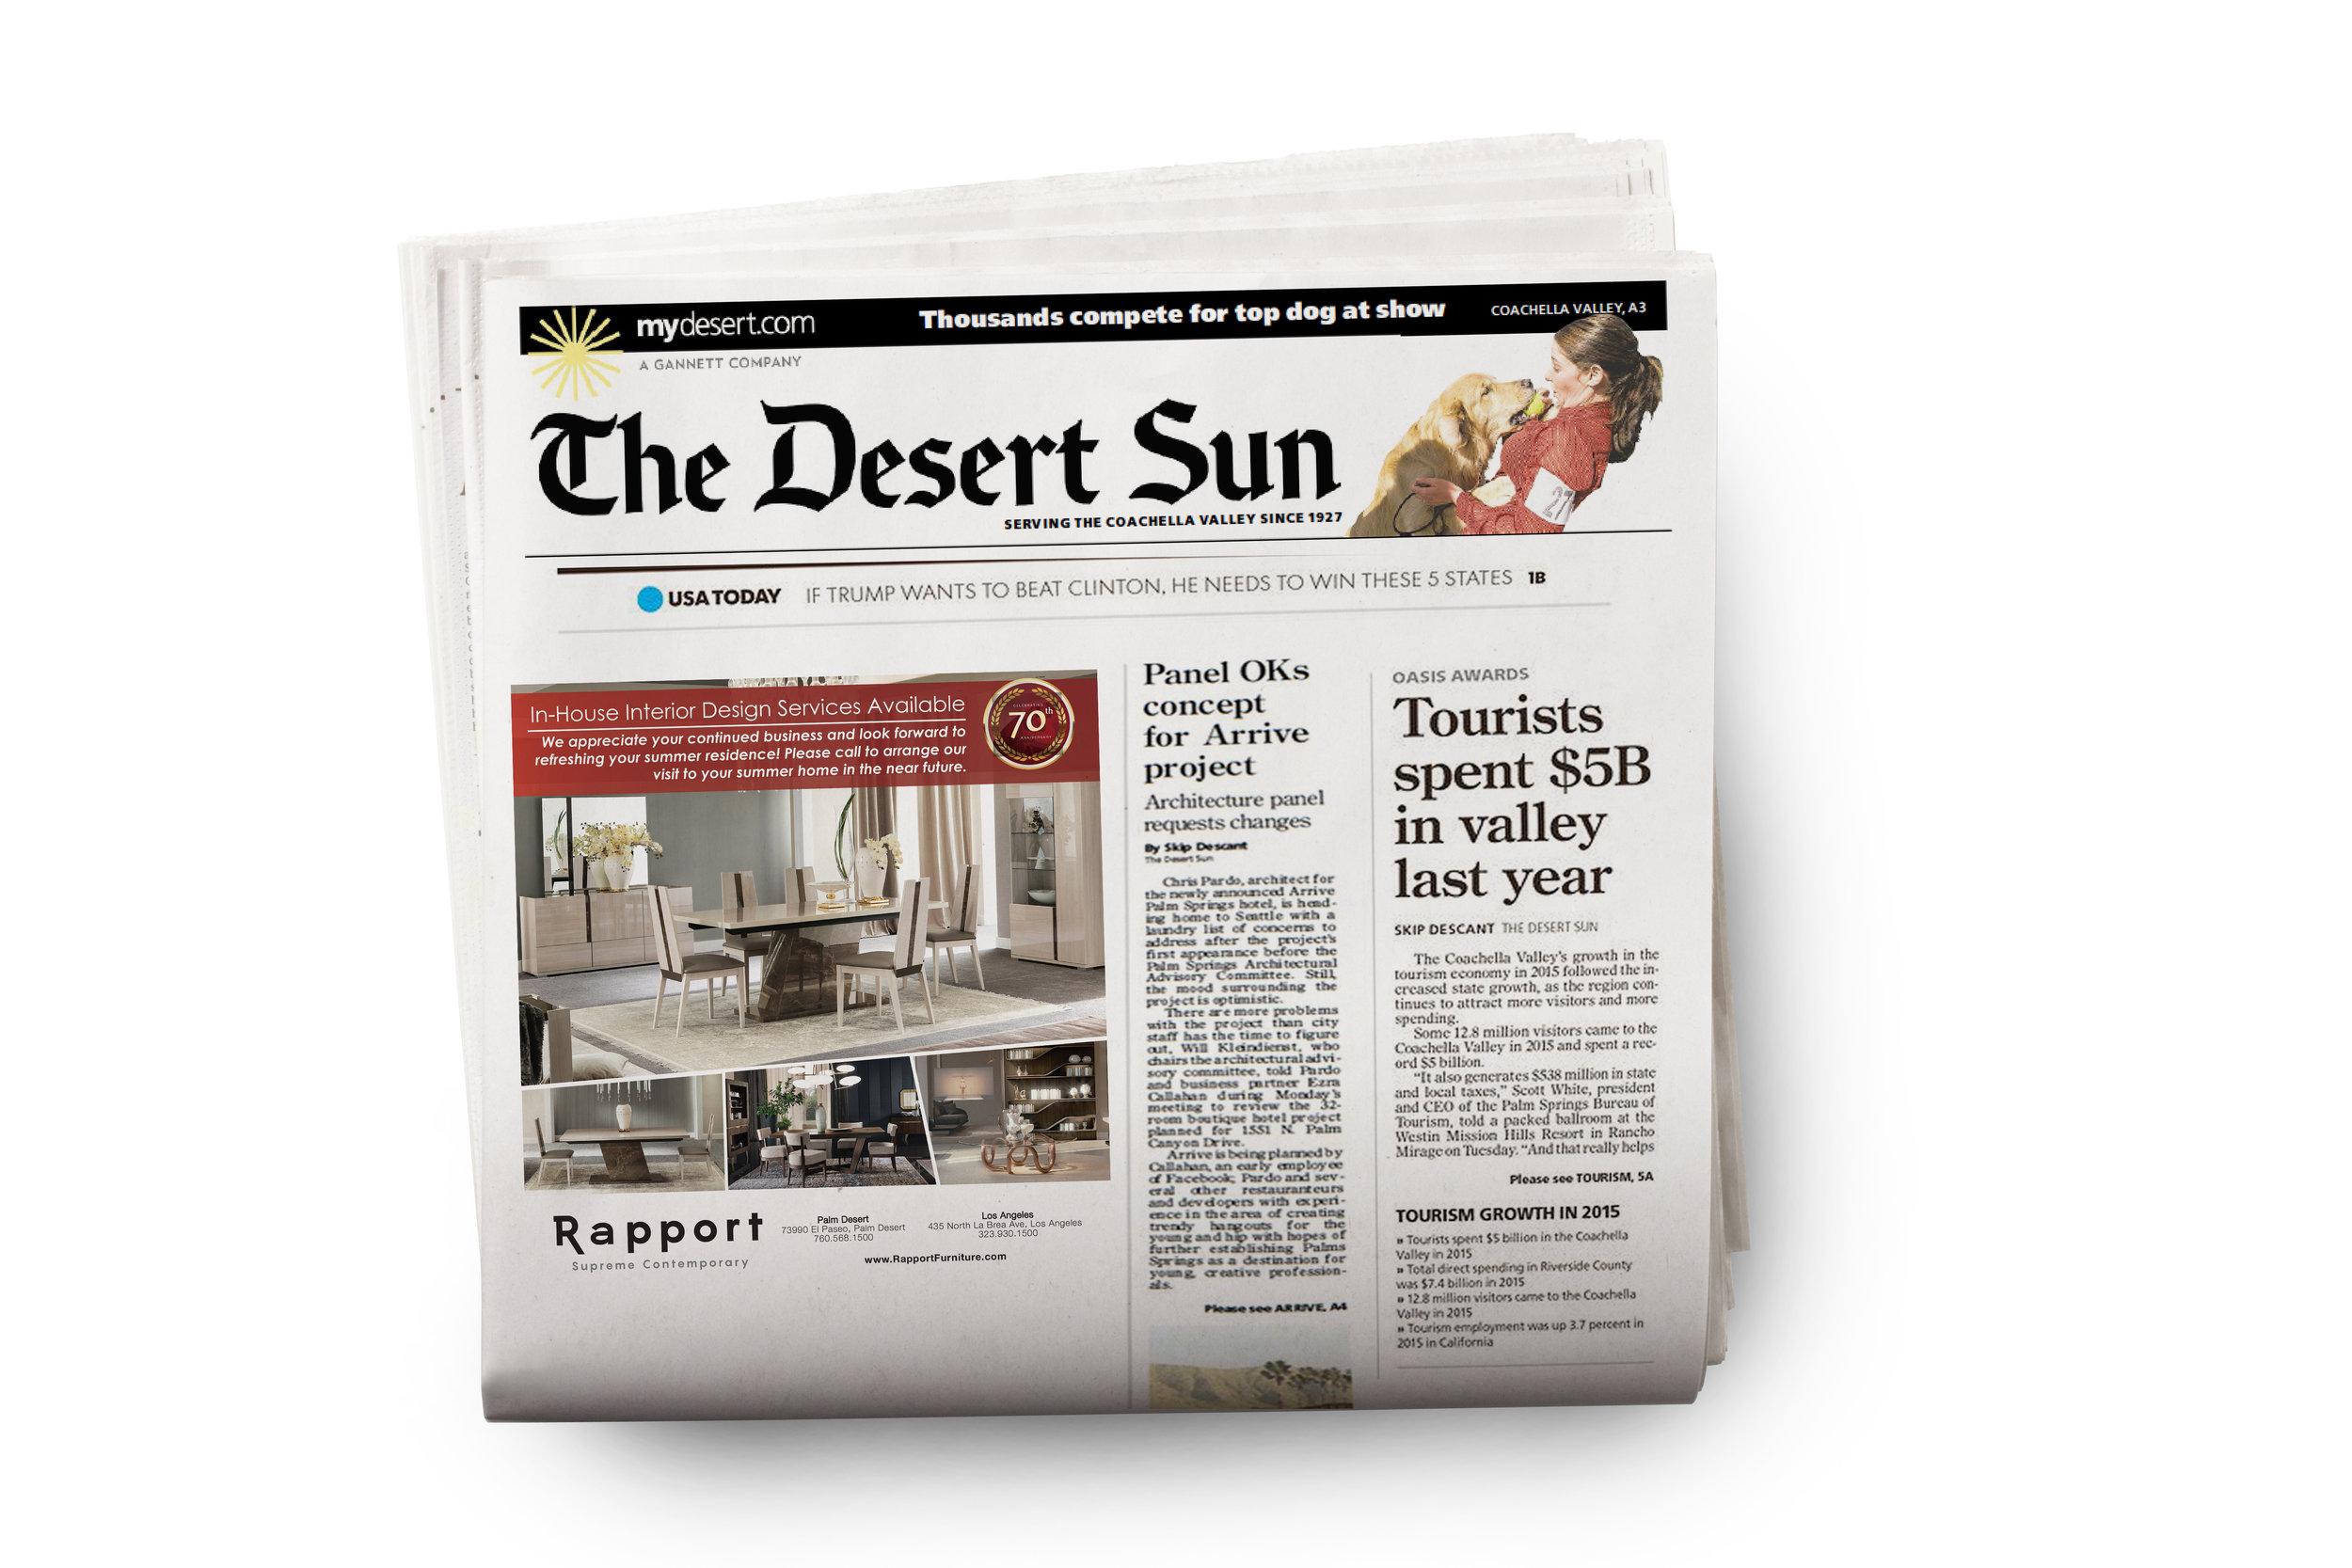 Rapport_DesertSunNewspaper_MOCKUP16.jpg